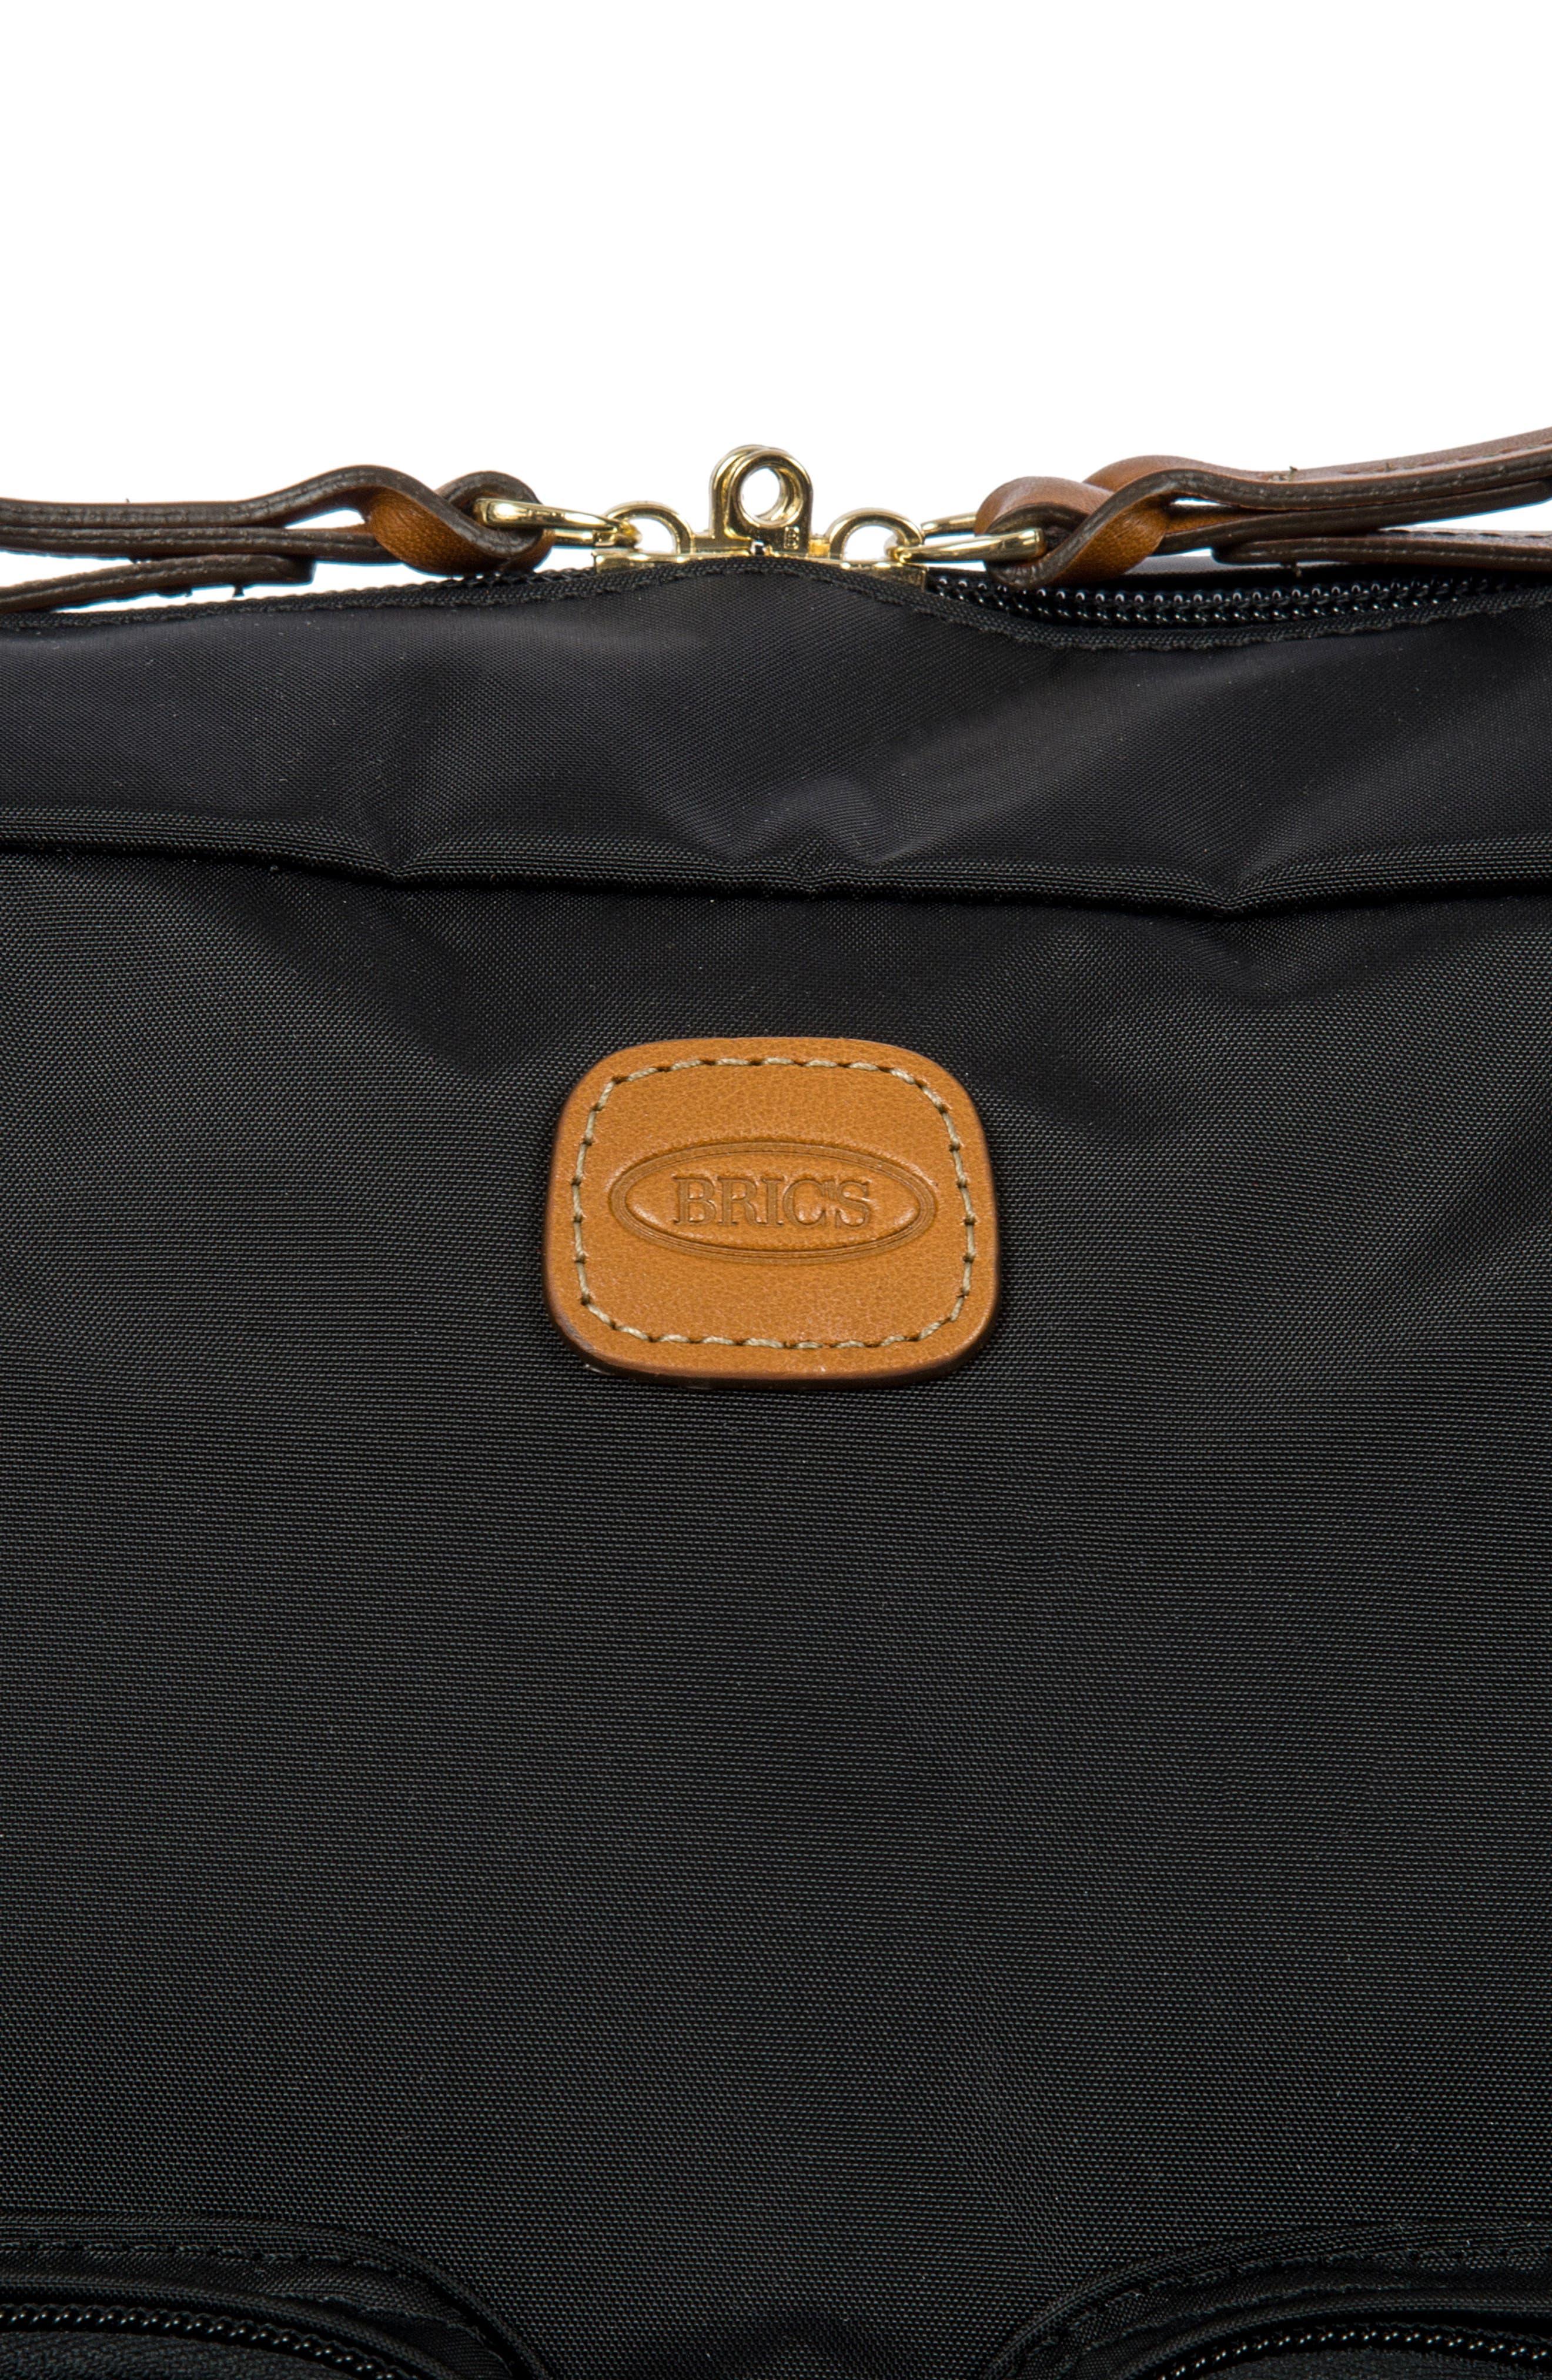 X-Bag Boarding 18-Inch Duffel Bag,                             Alternate thumbnail 5, color,                             Black